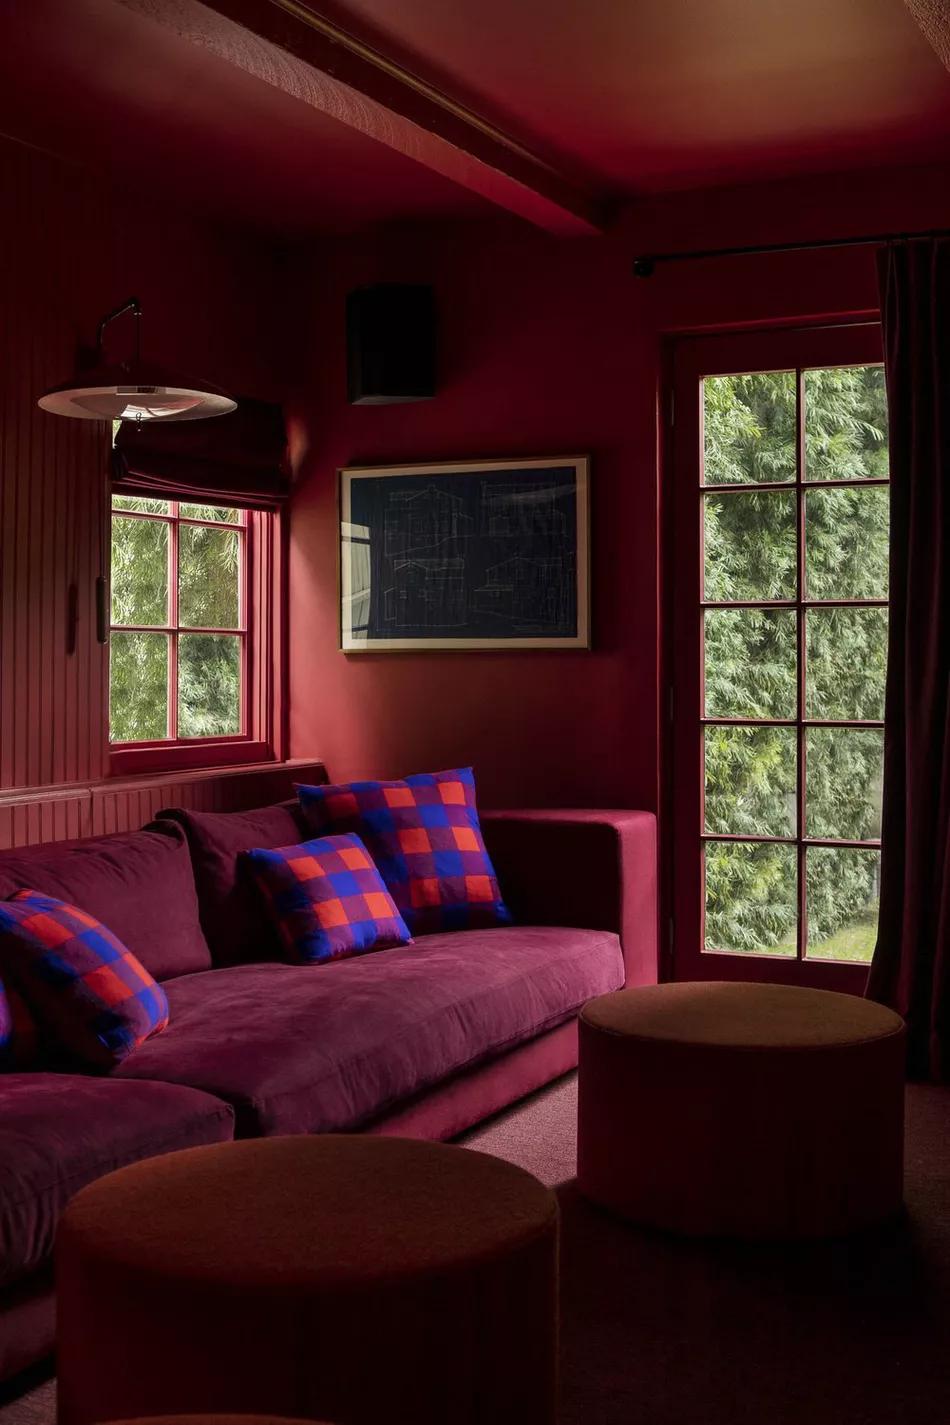 12 Of The Best Interior Design Blogs To Bookmark Right Now Best Interior Design Blogs Interior Design Blog Interior Design